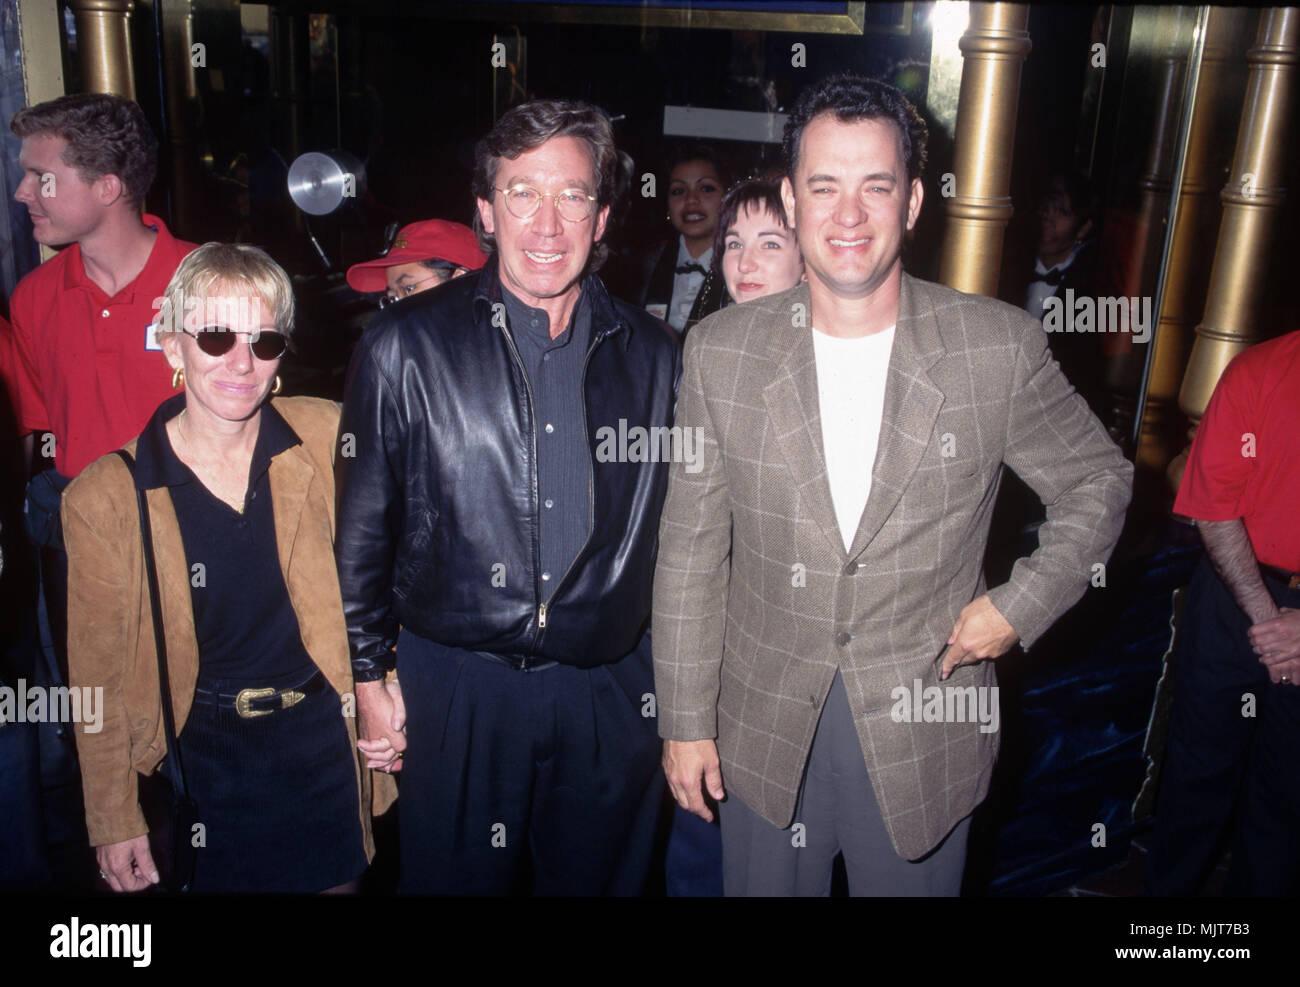 Tim Allen and Wife with Tom Hanks --- ' Tsuni / USA 'Tim Allen and Wife with Tom Hanks Tim Allen and Wife with Tom Hanks inquiry tsuni@Gamma-USA.com - Stock Image